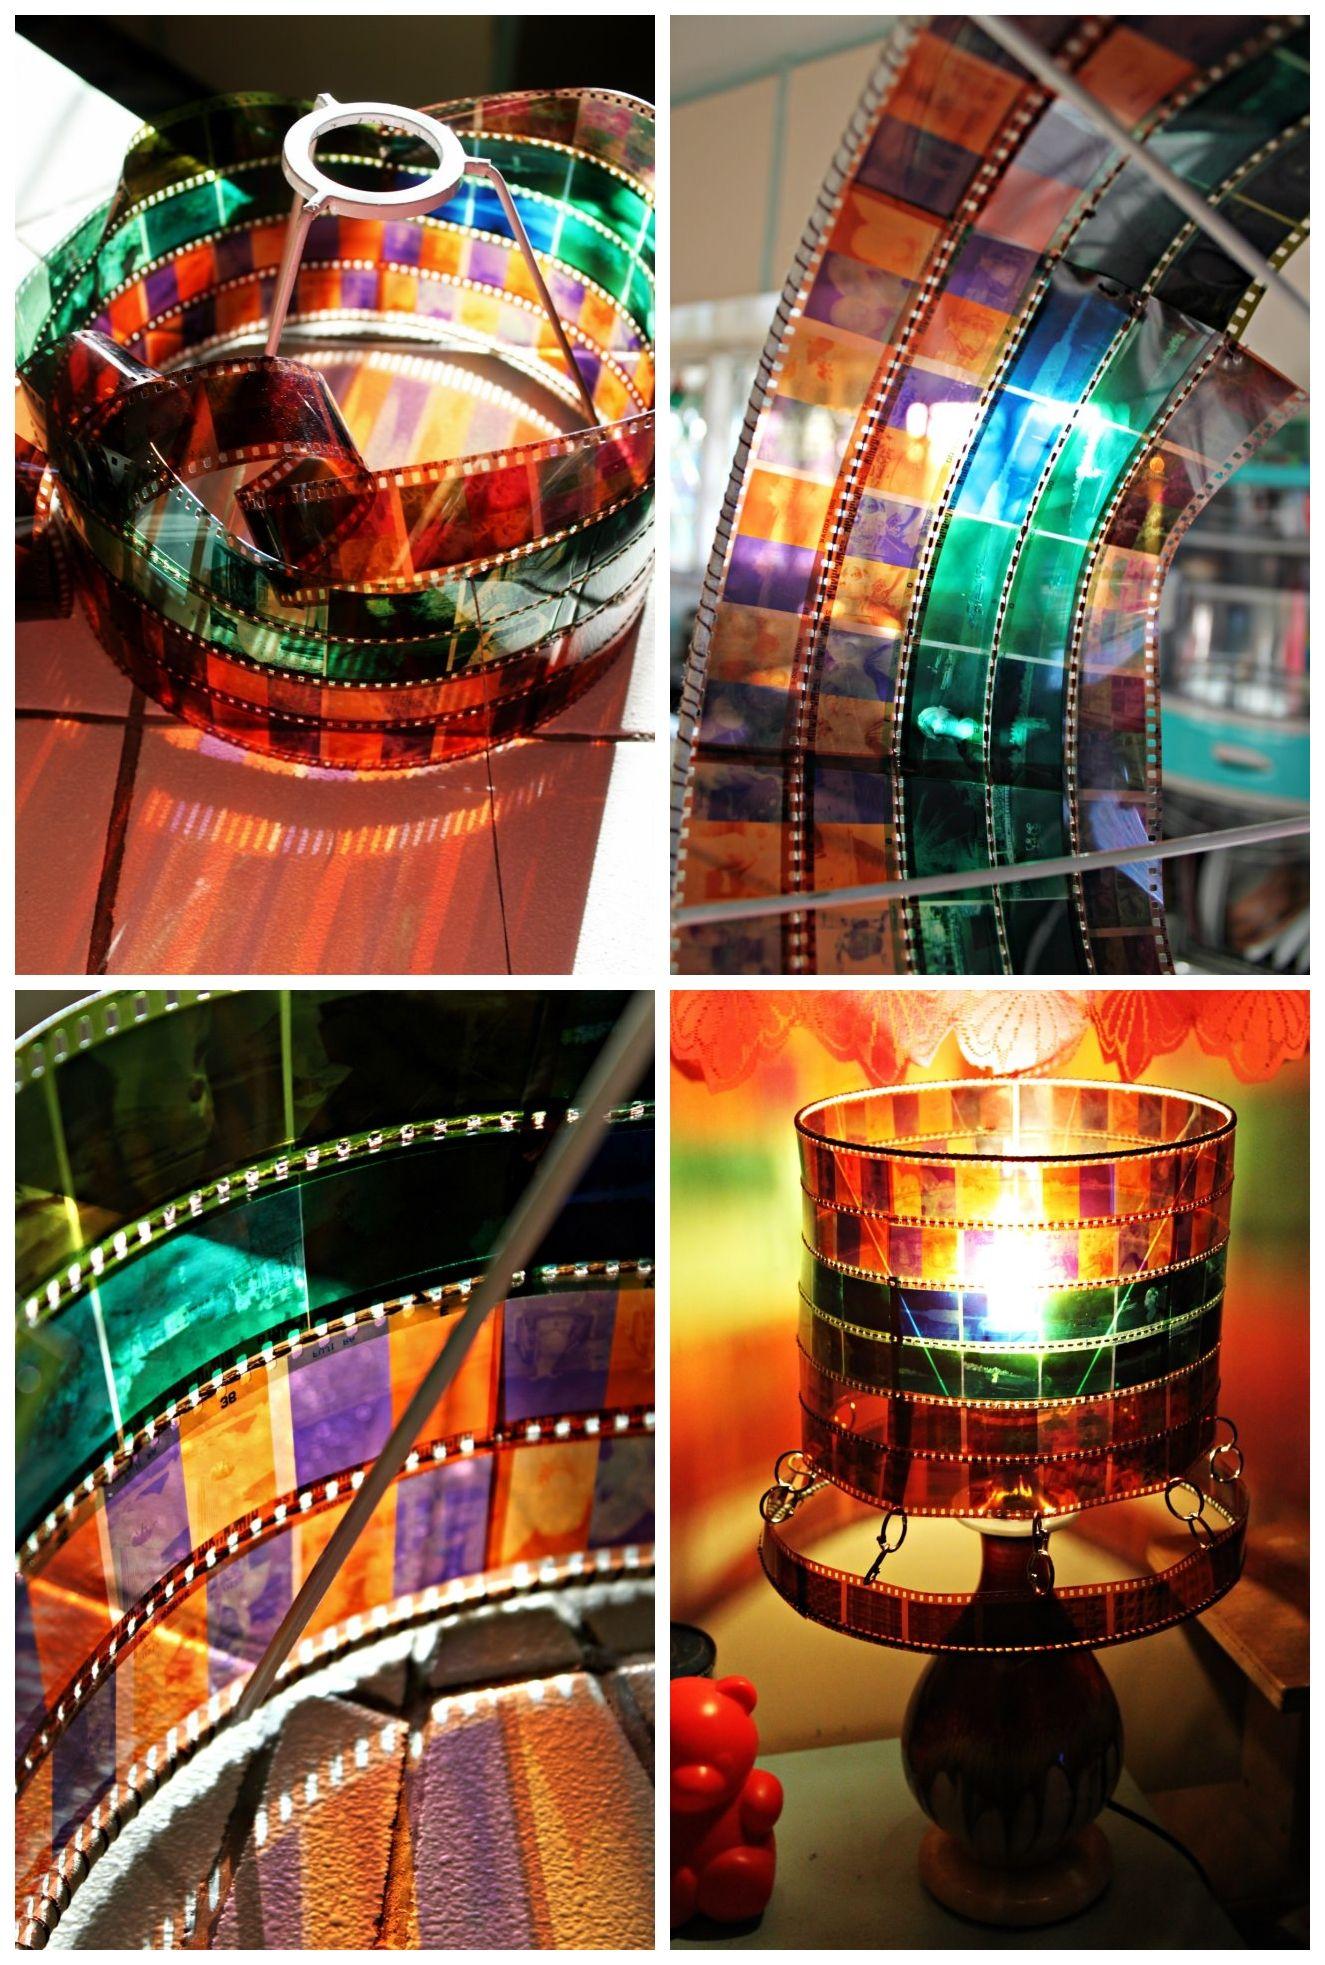 Lamp Shade Made from 35mm Negatives | DIY & Crafts | Pinterest ...